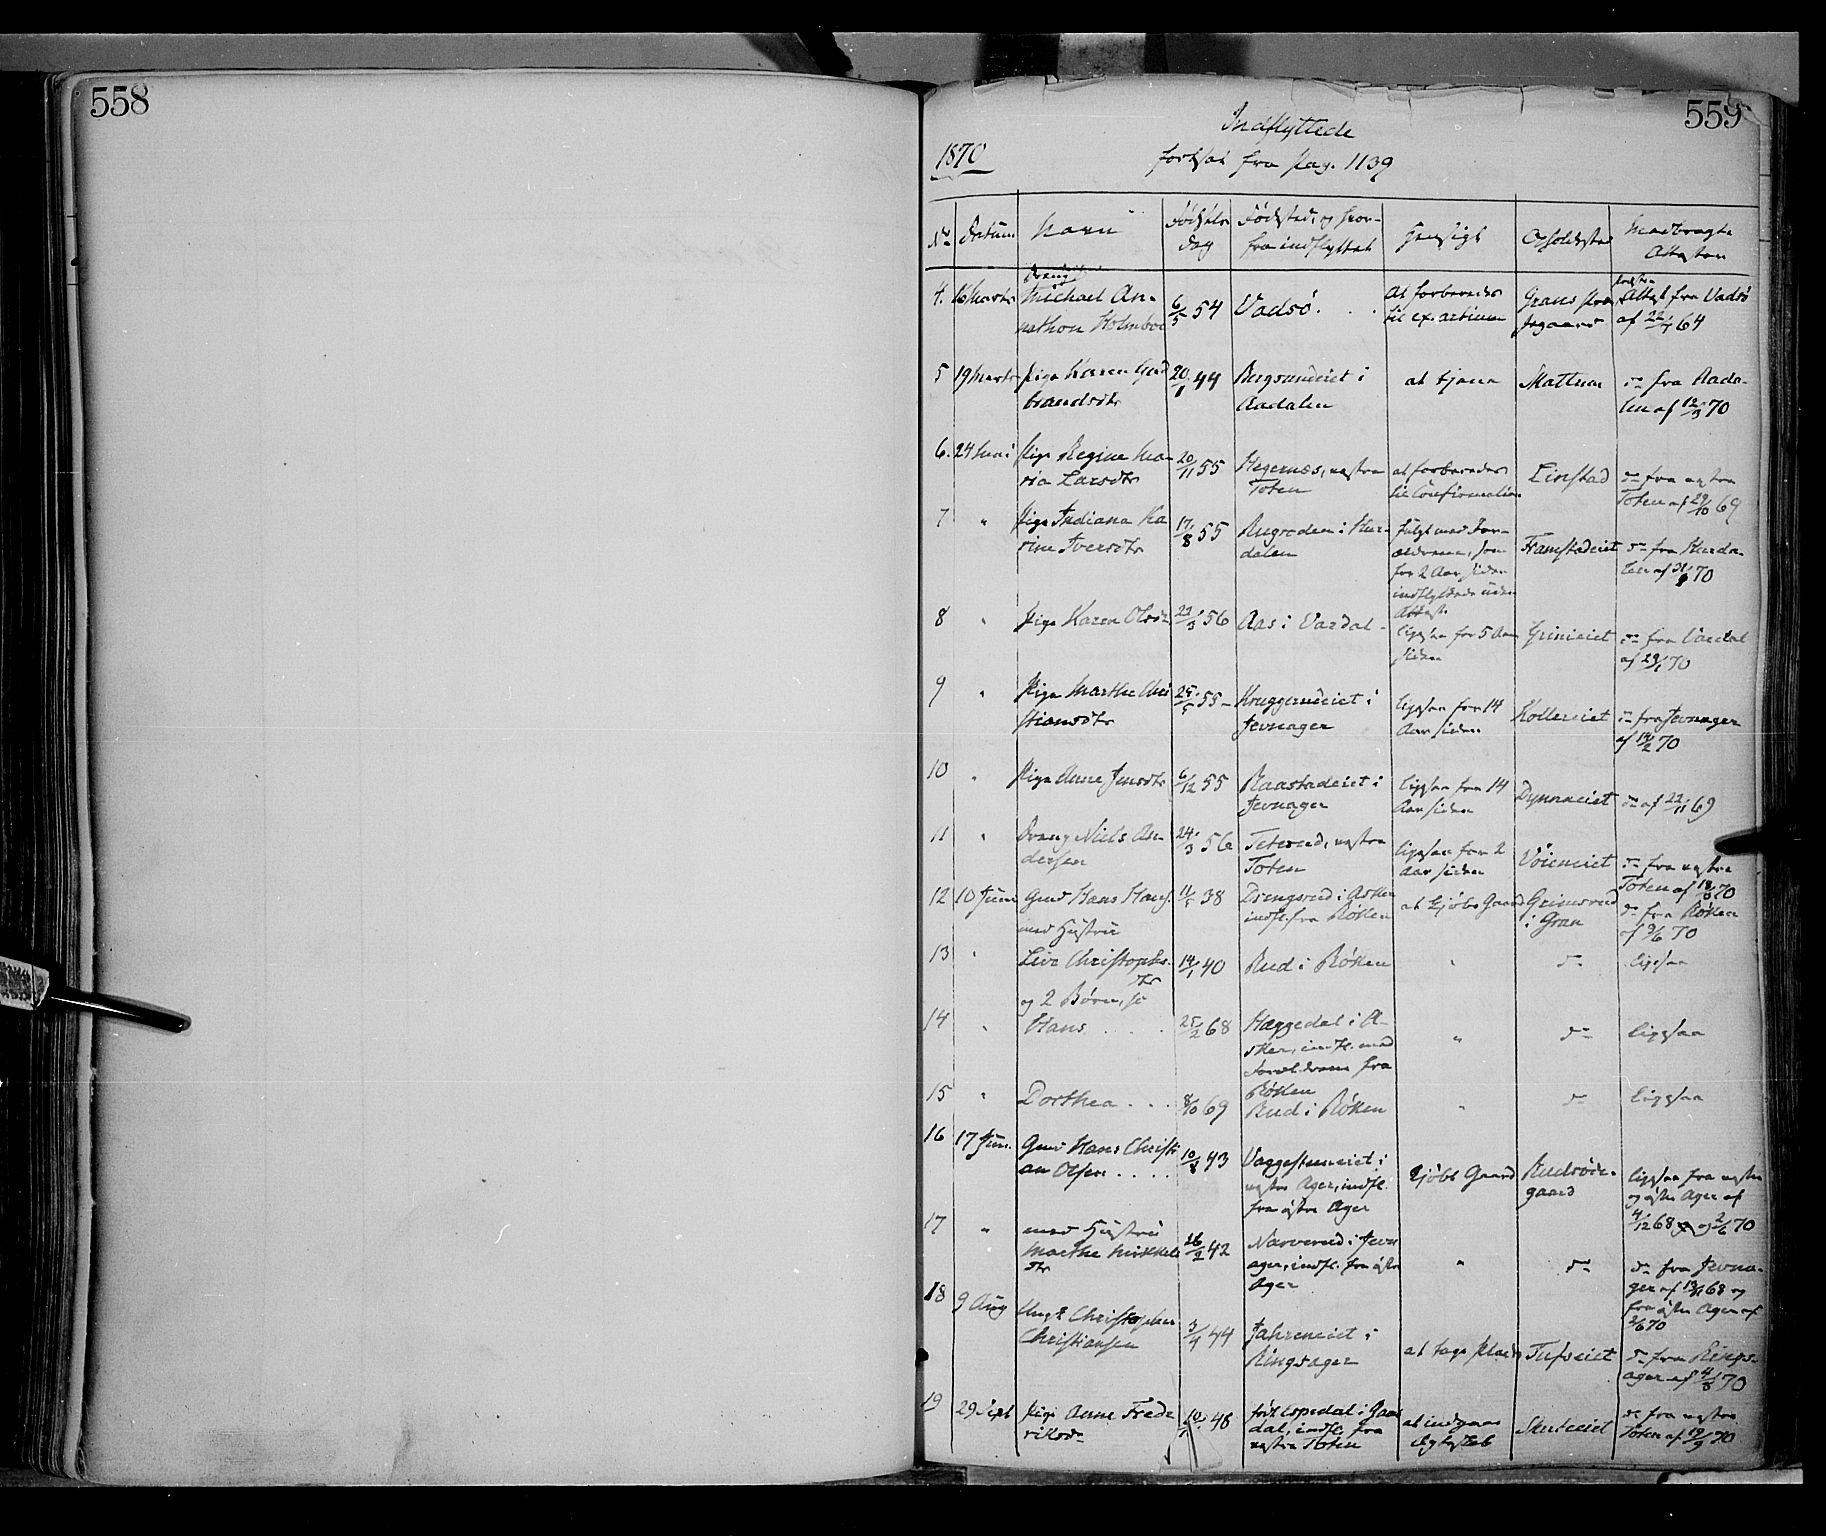 SAH, Gran prestekontor, Ministerialbok nr. 12, 1856-1874, s. 558-559